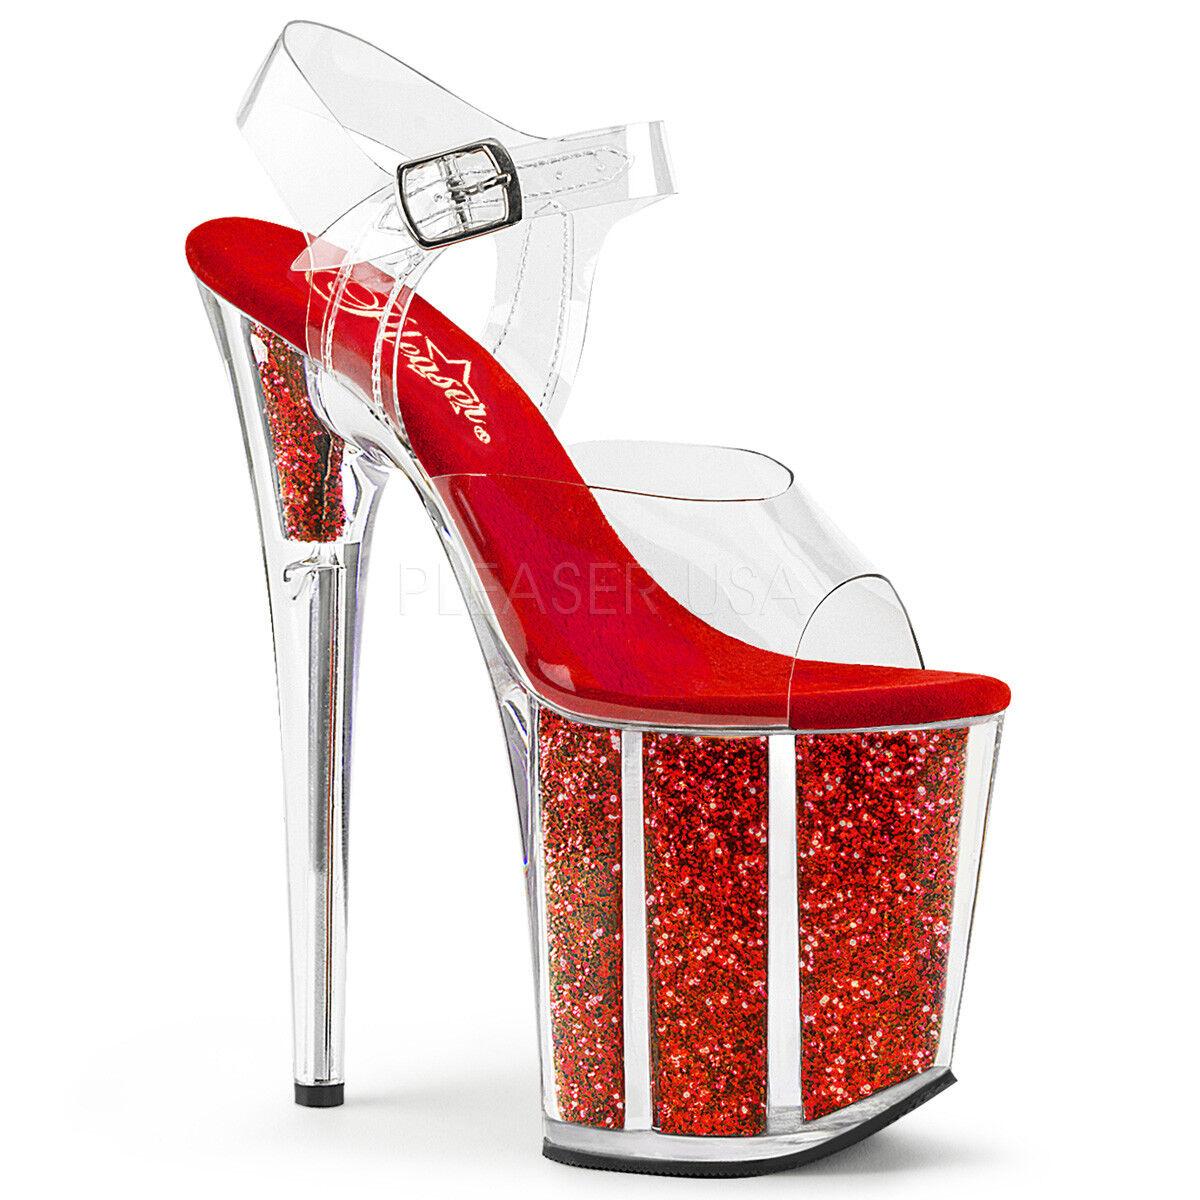 Pleaser FLAMINGO - 808 G rouge glitter plateforme Pole Dancing Sandales Chaussures